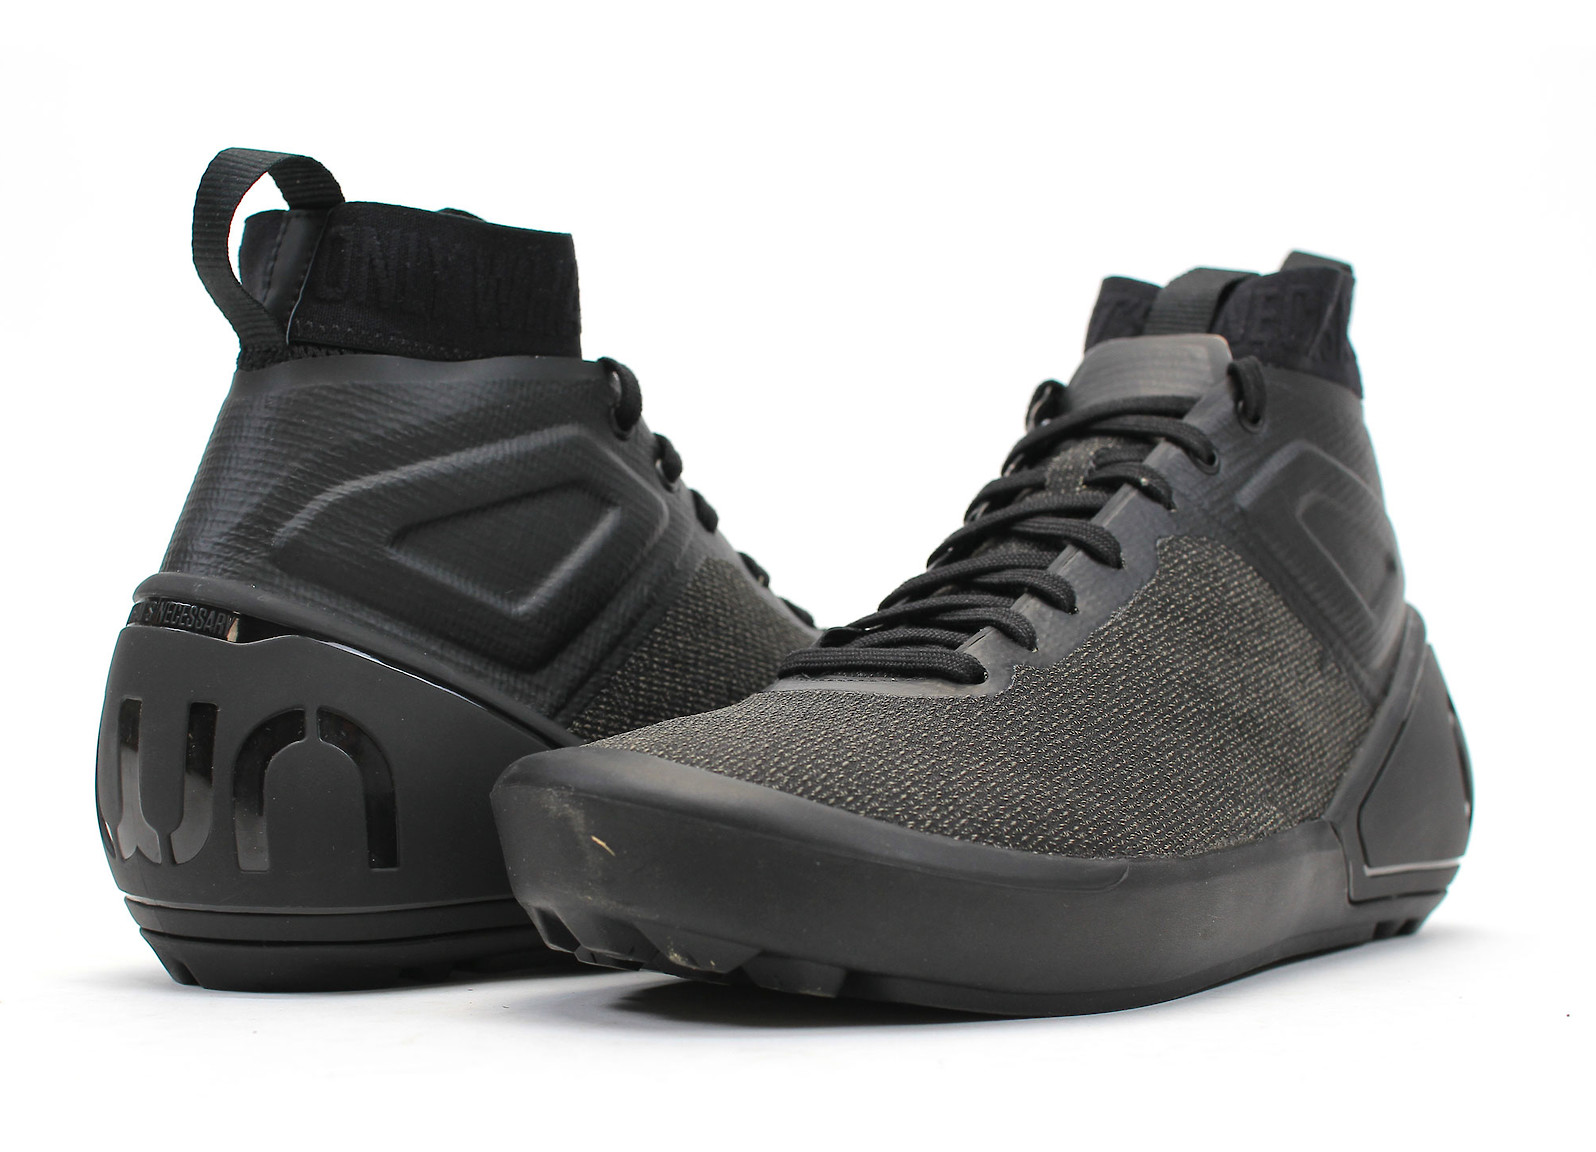 OWN FR-01 Flat Pedal Shoe